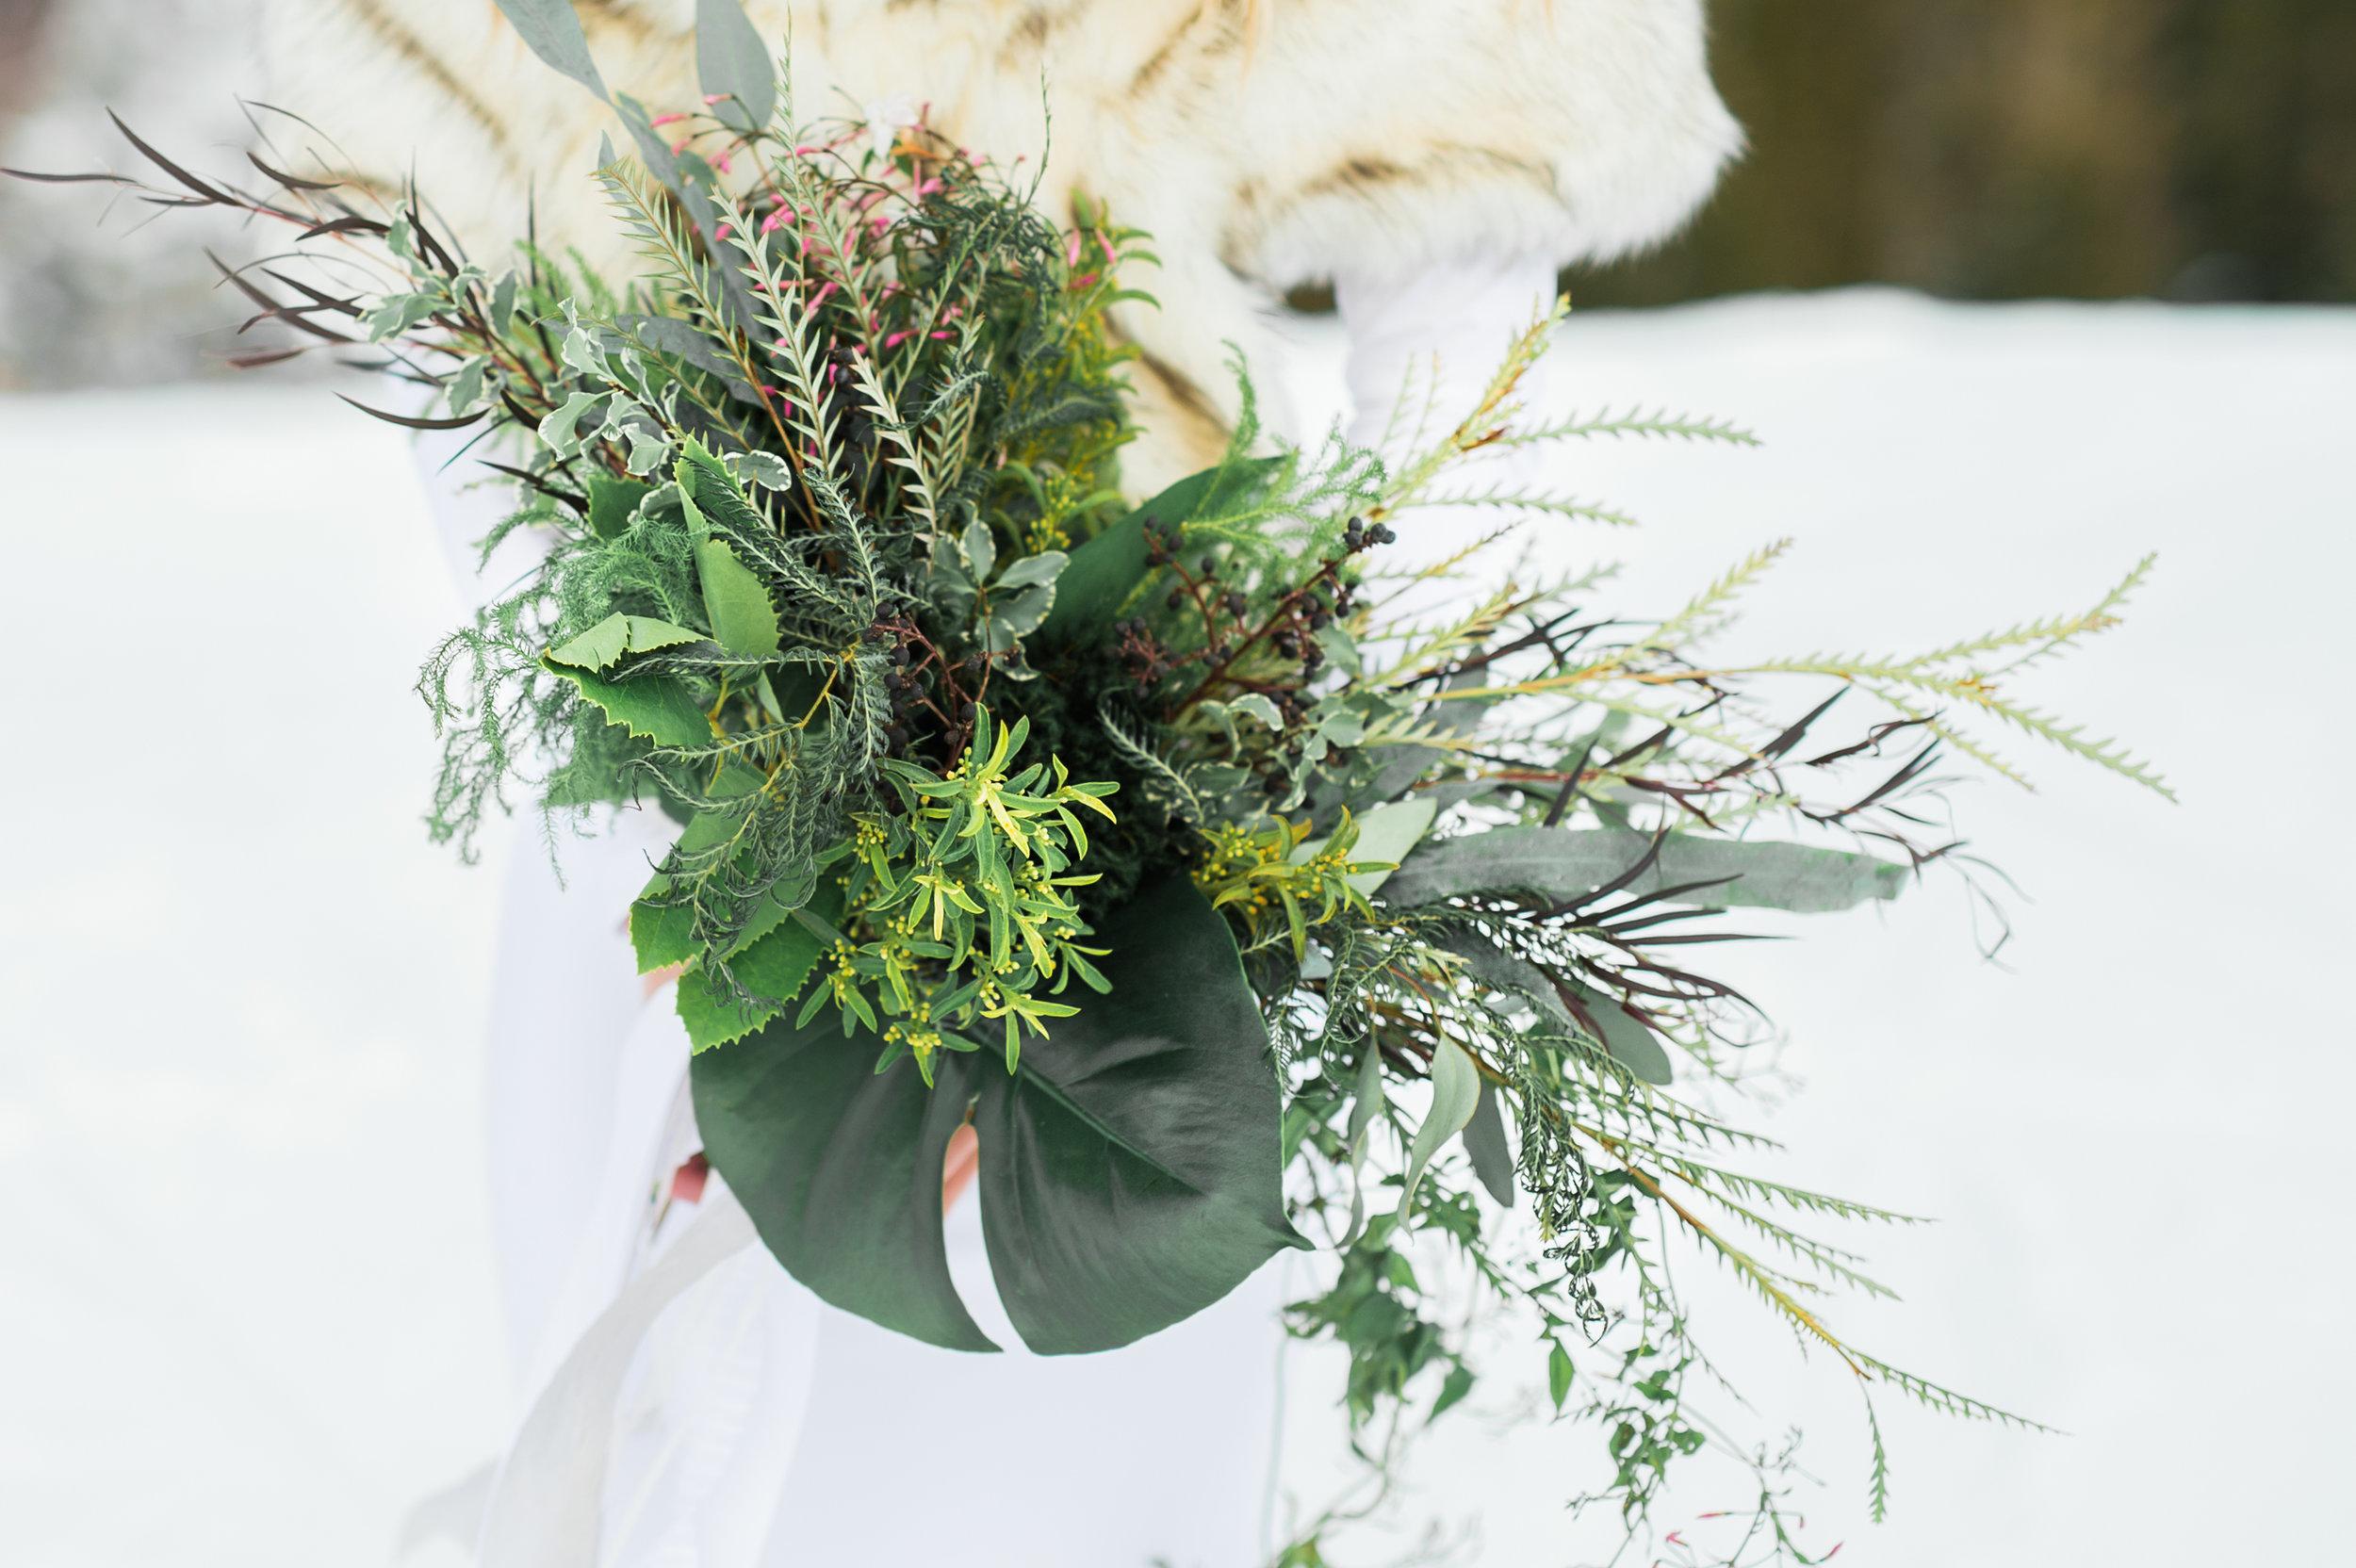 Grevillea, Jasmine, Seeded Eucalyptus, Elkhorn Moss, Assorted Chilean Ferns